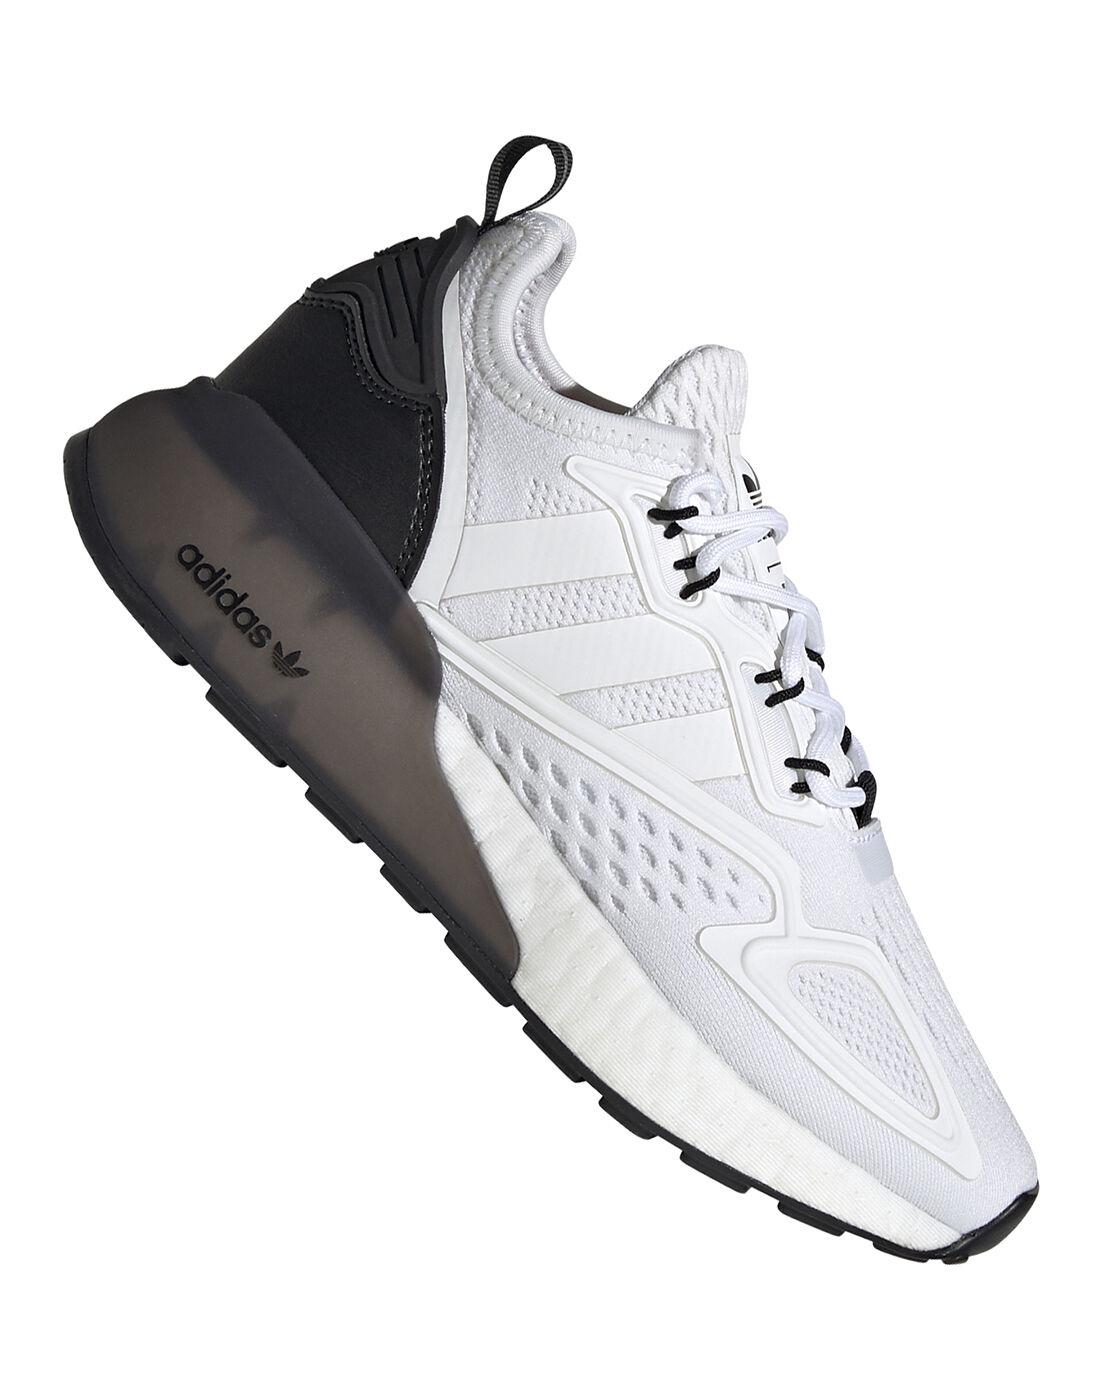 adidas Originals navy blue nike basketball shoes boys sneakers sale   Older Kids 2K BOOST